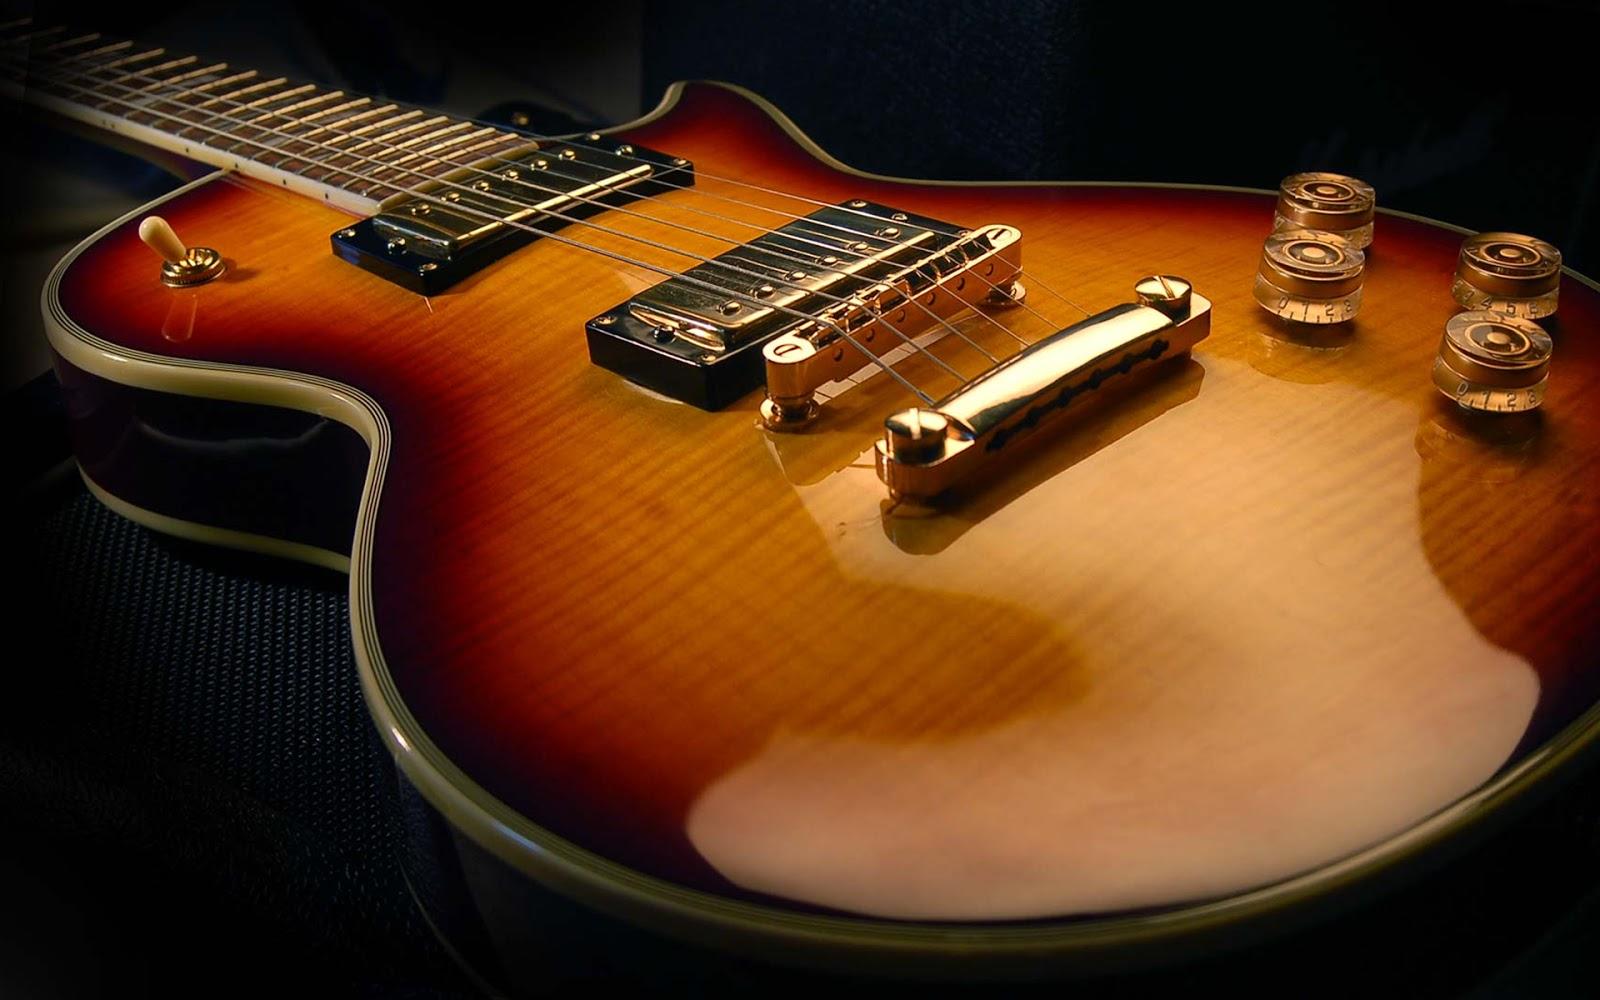 guitar download high res wallpaper